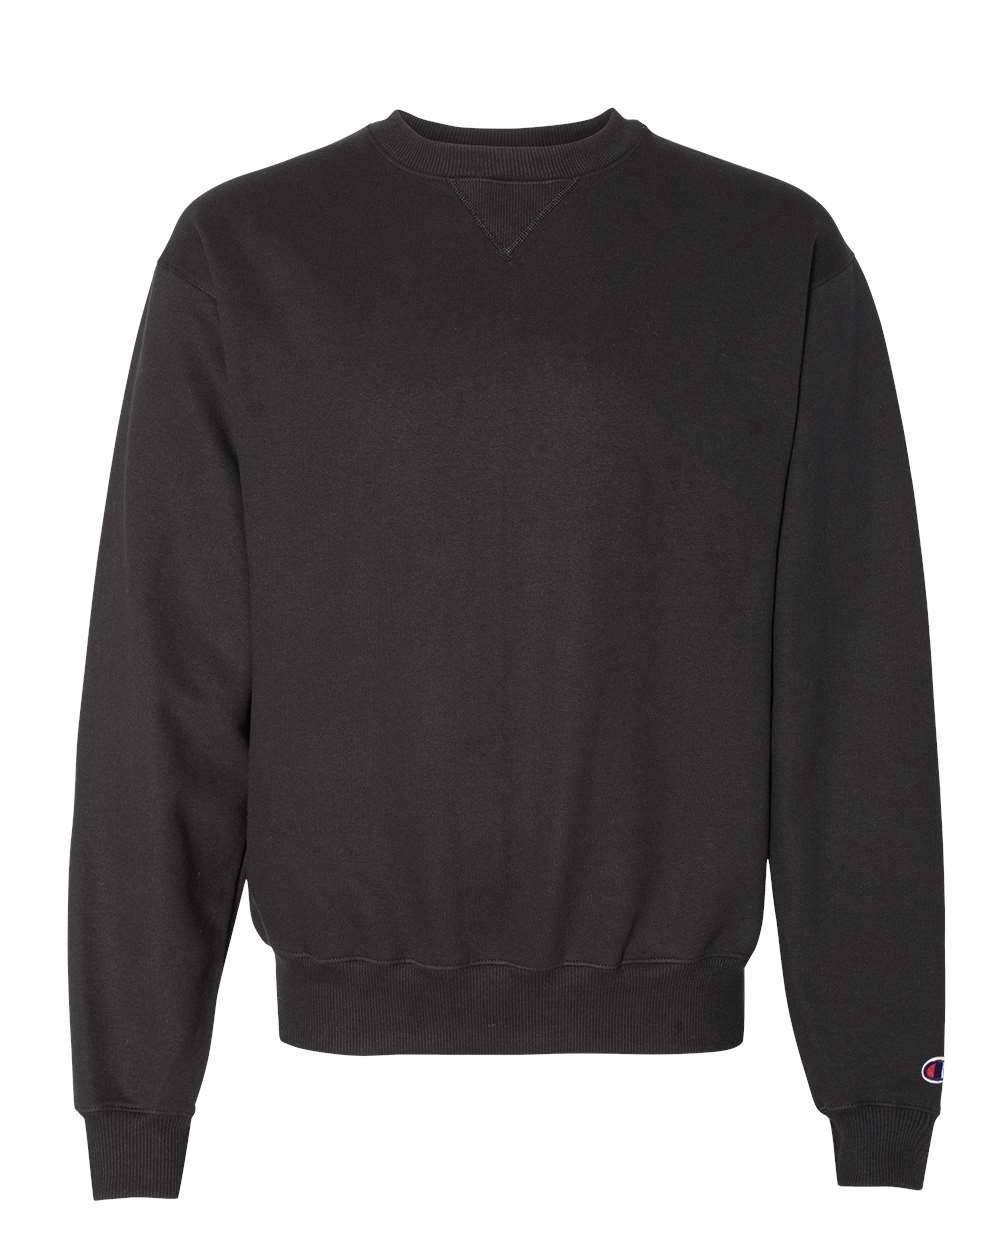 Champion-Mens-Cotton-Max-Crewneck-Sweatshirt-Pullover-S178-up-to-3XL miniature 6